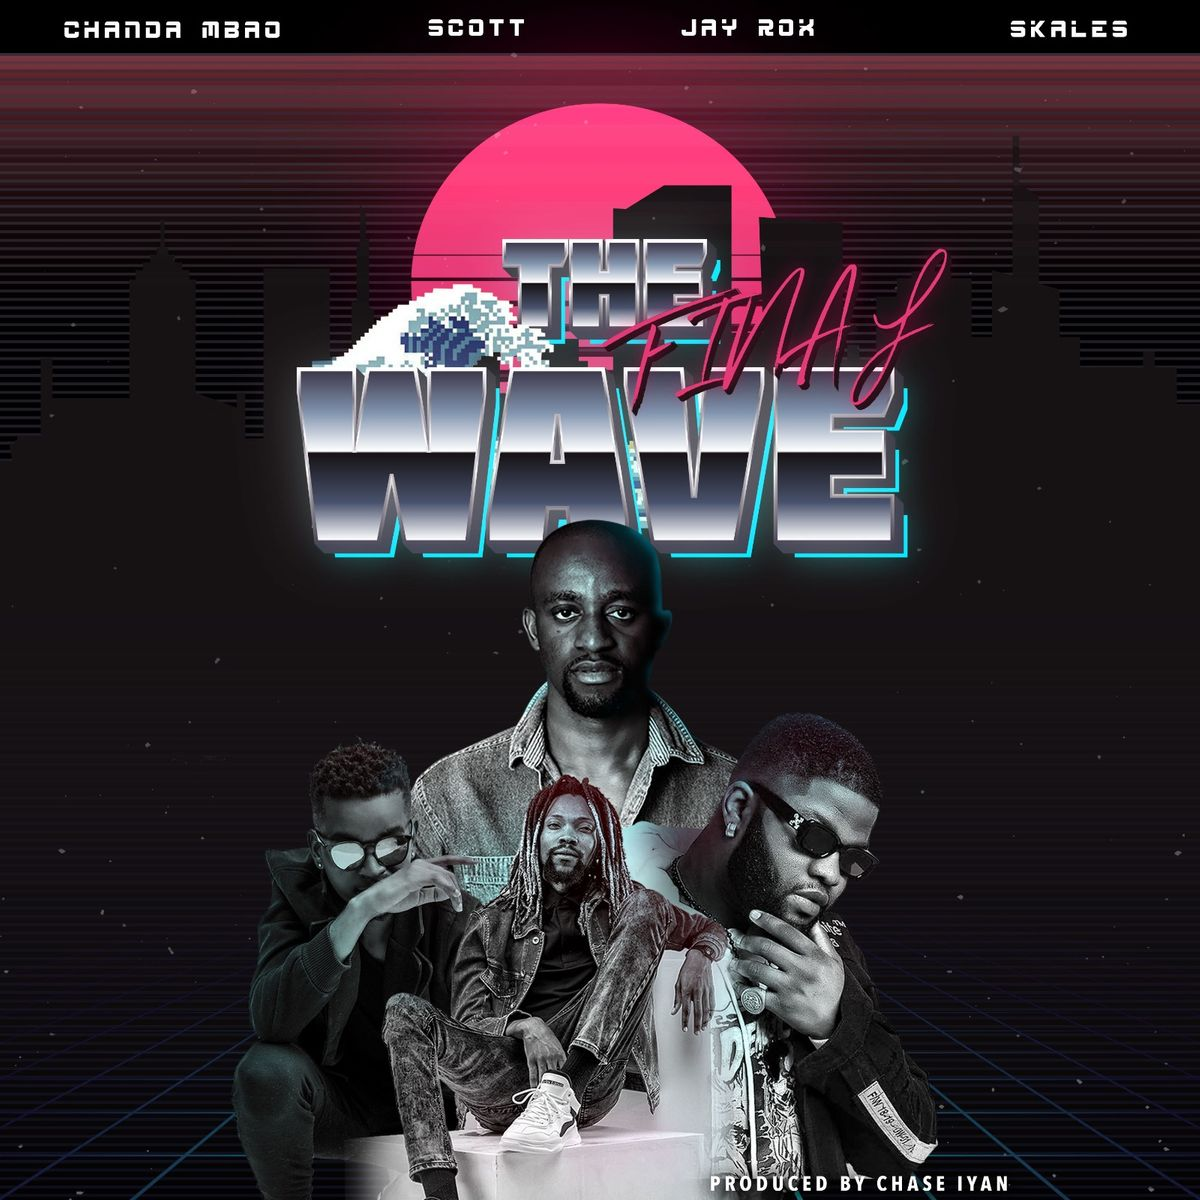 Chanda Mbao ft. Skales, Jay Rox & Scott - The Final Wave